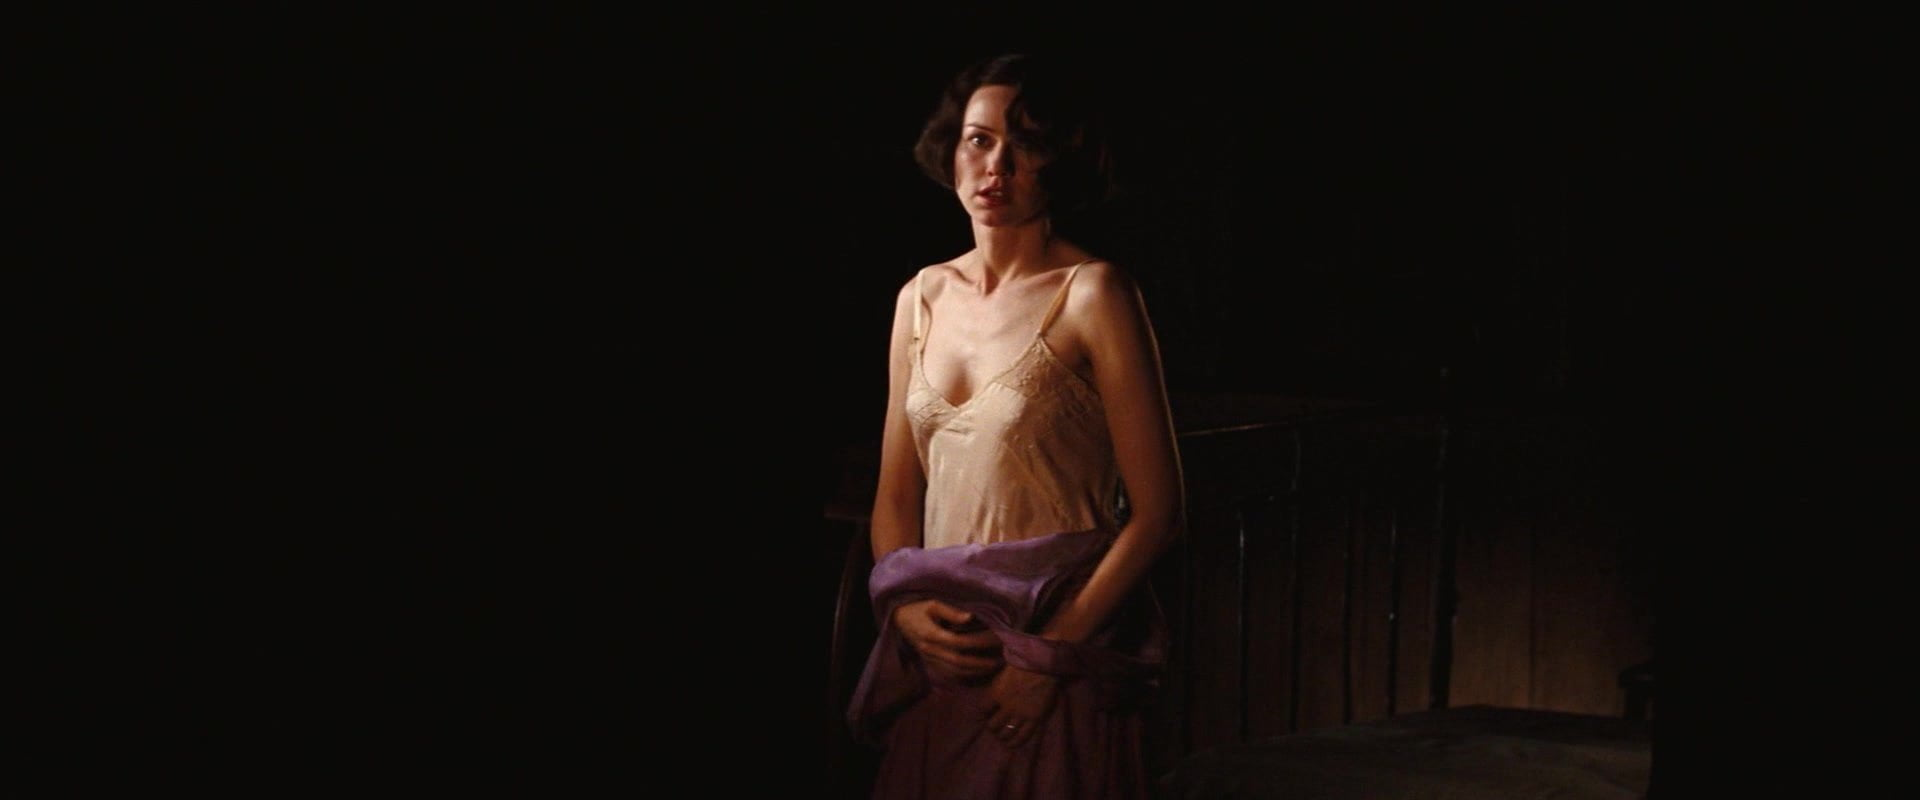 Celeb Naomie Watts Nude Images